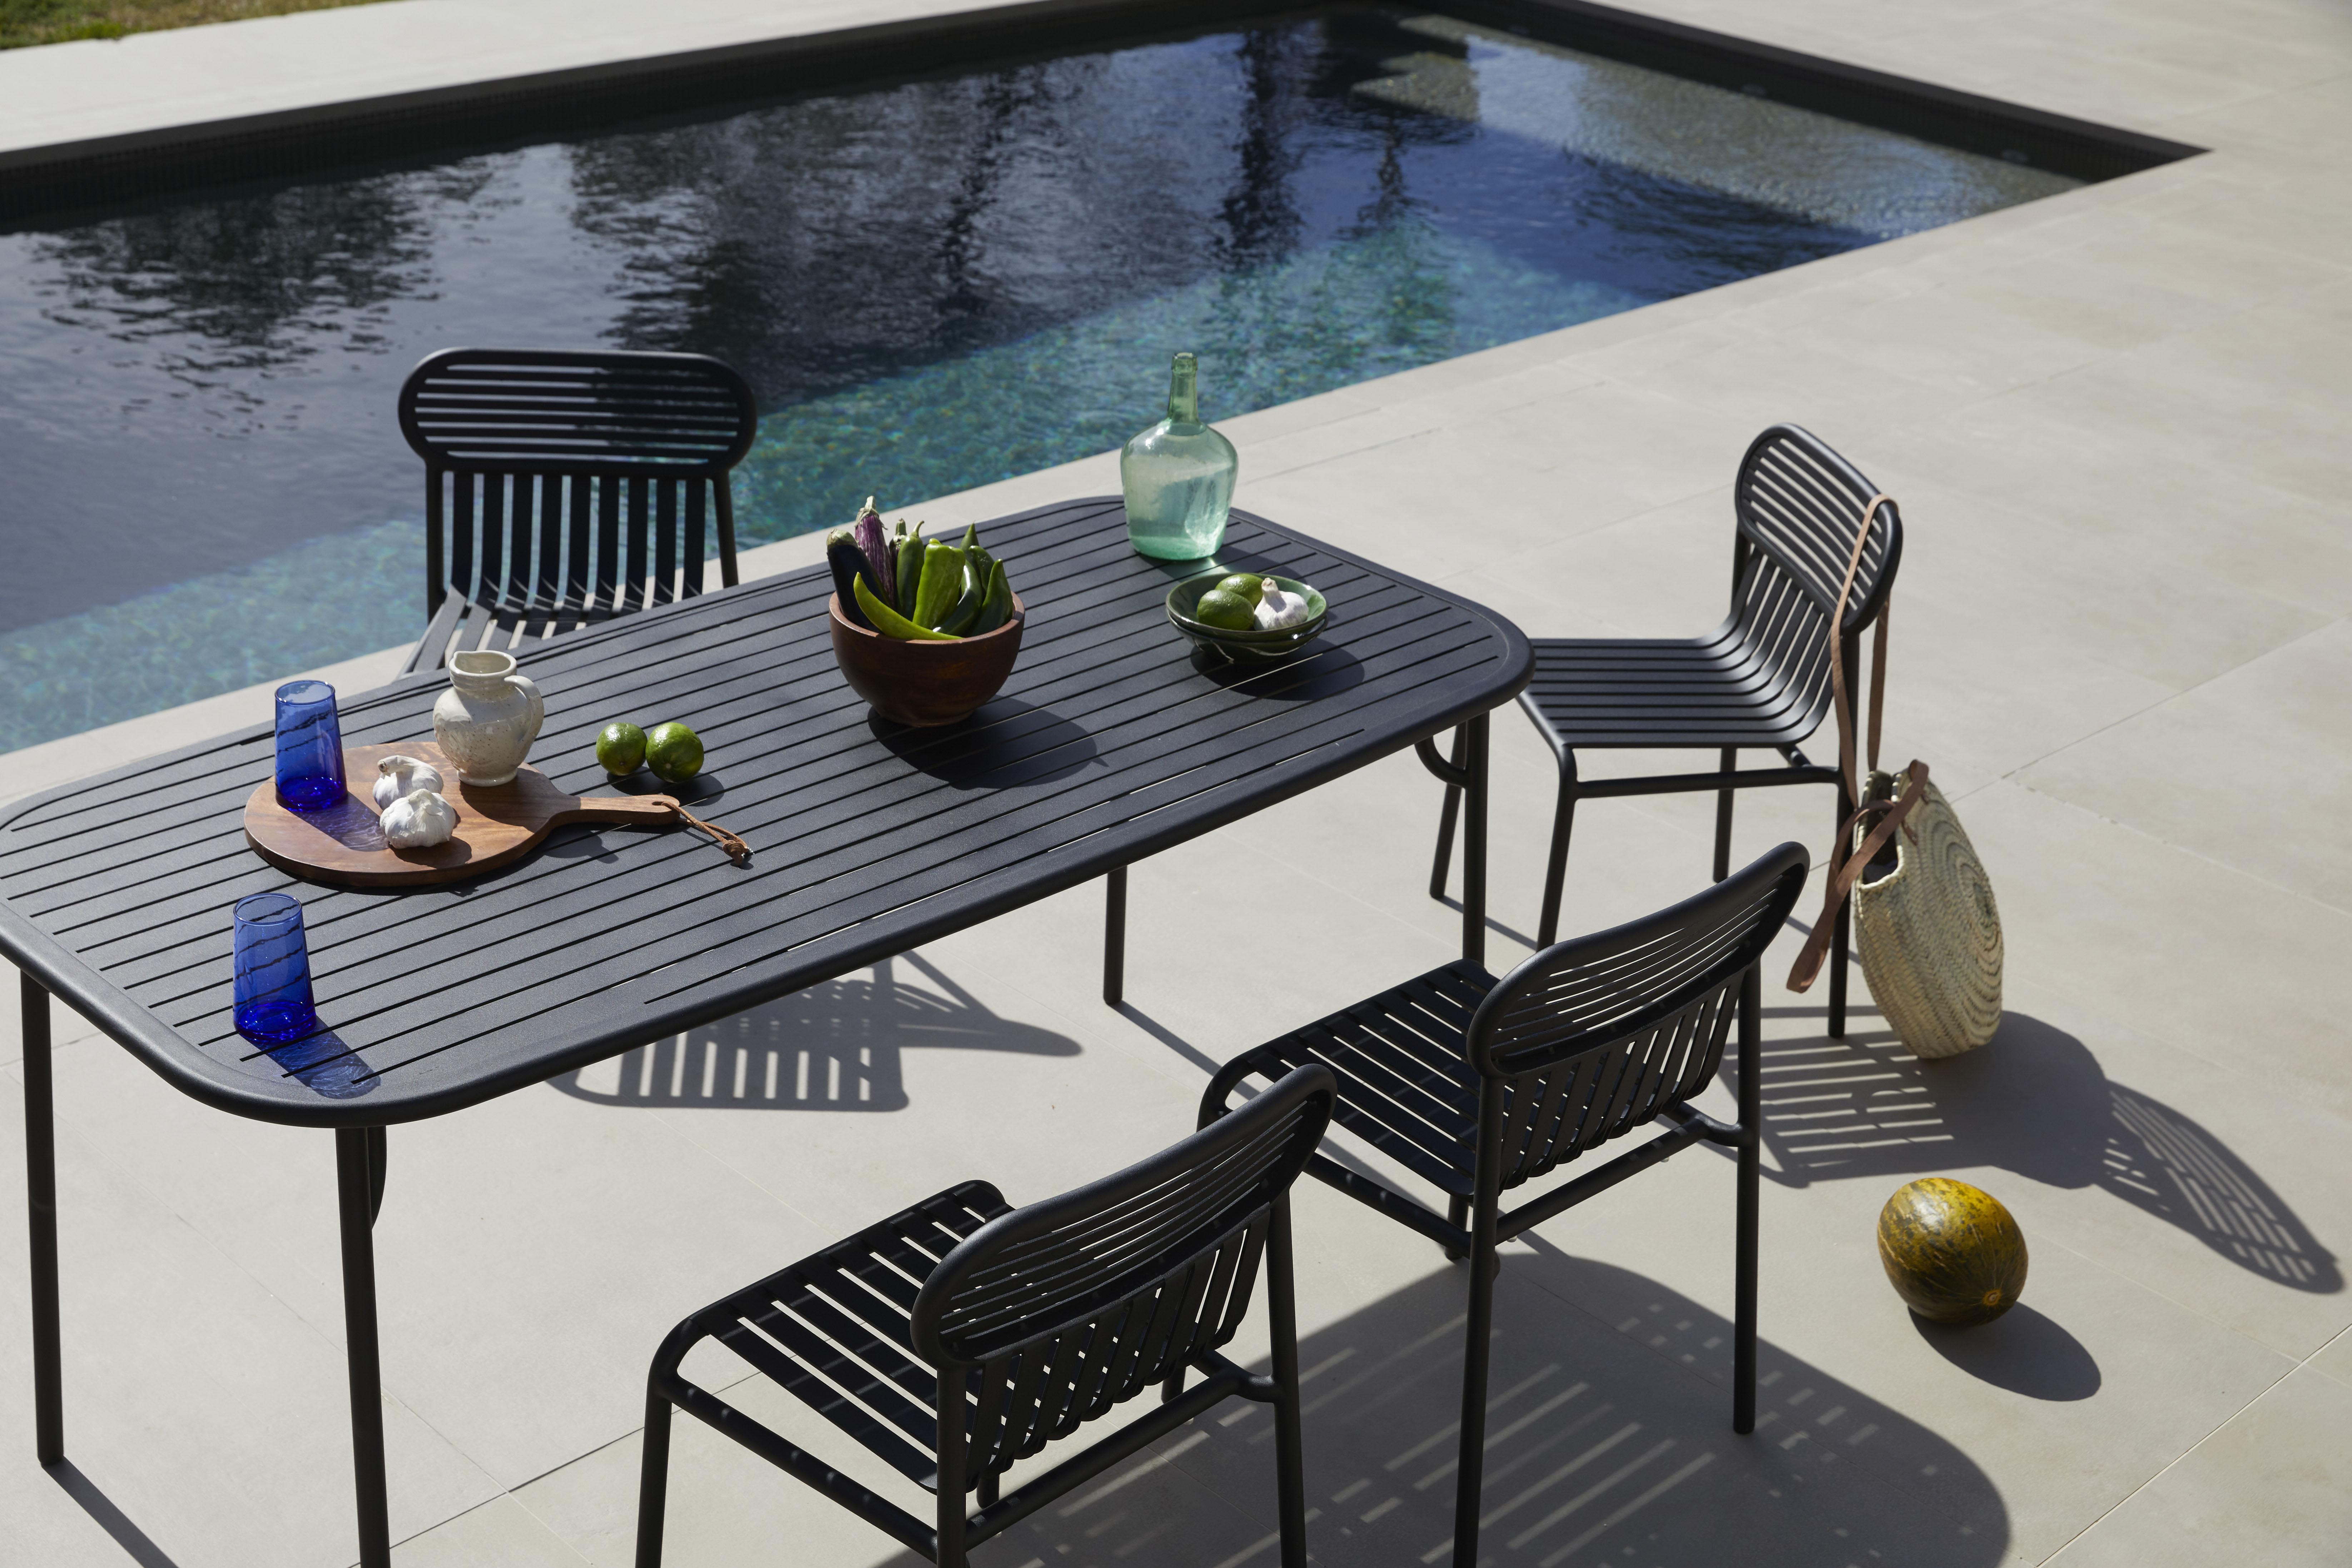 Table rectangulaire Week-end / 180 x 85 cm - Aluminium - Petite Friture